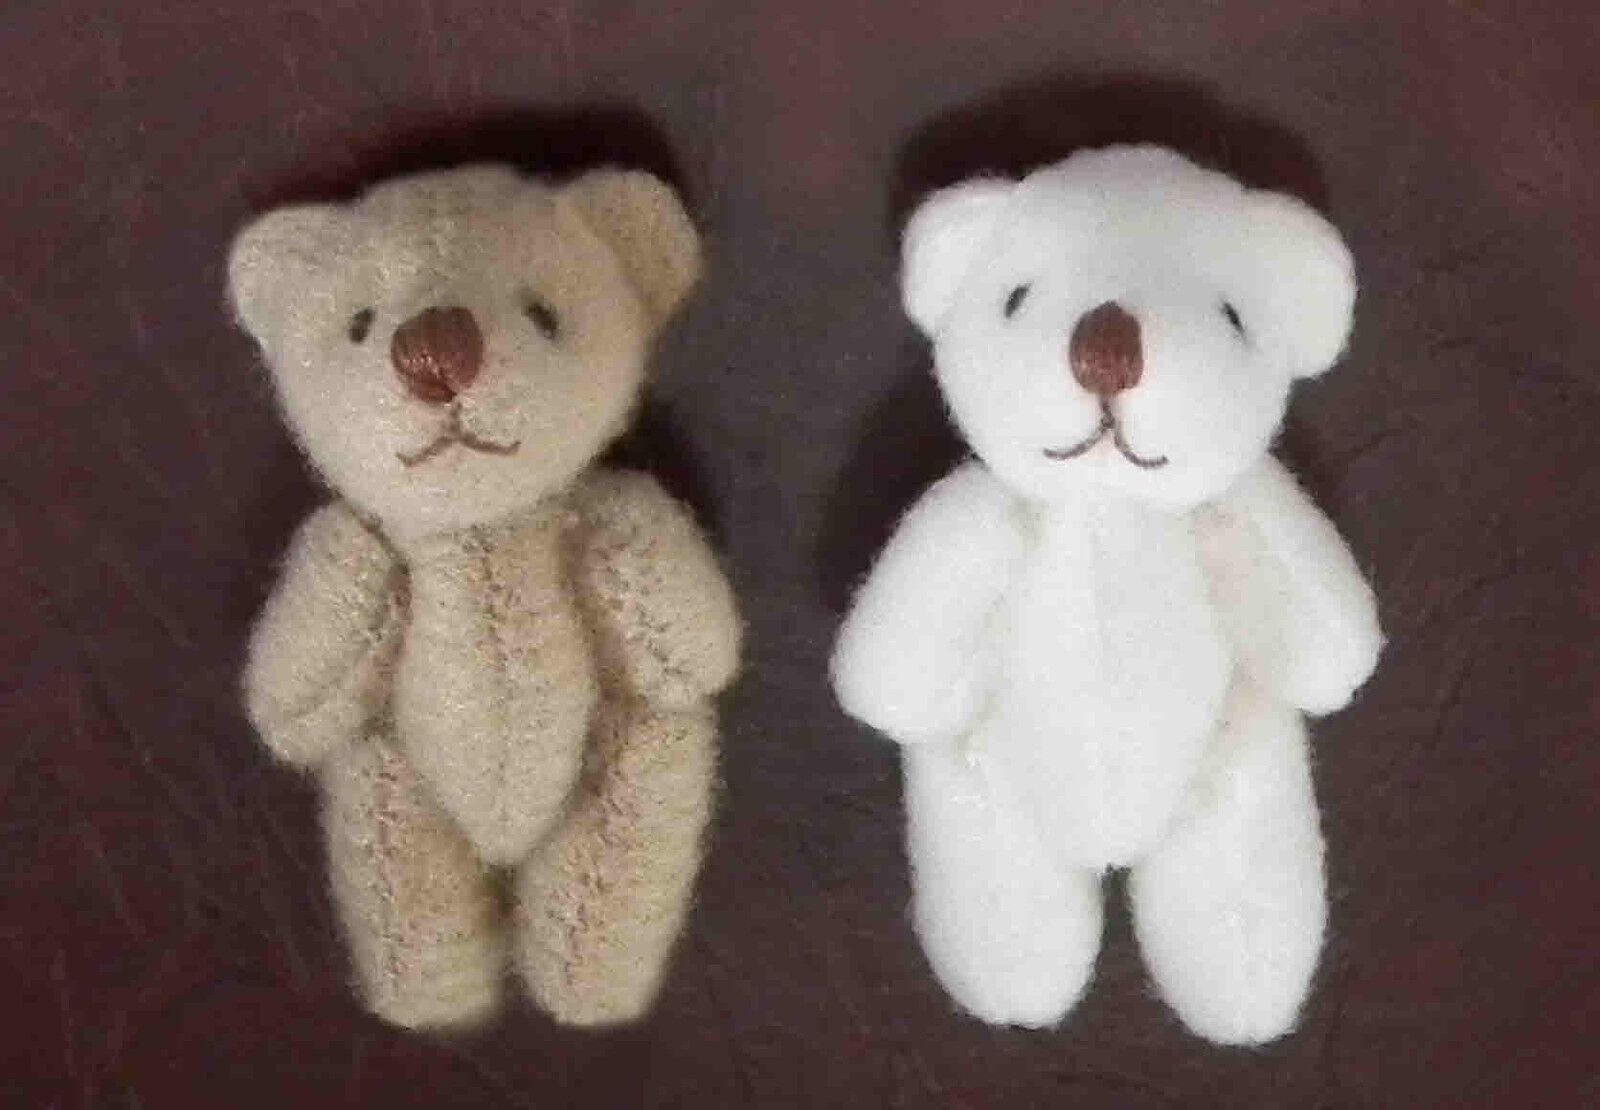 1 12 Dolls House miniature Toy 2x Teddy Bears Teddies Set Nursery Toy miniature Cot Fairy LGW 94ee8f